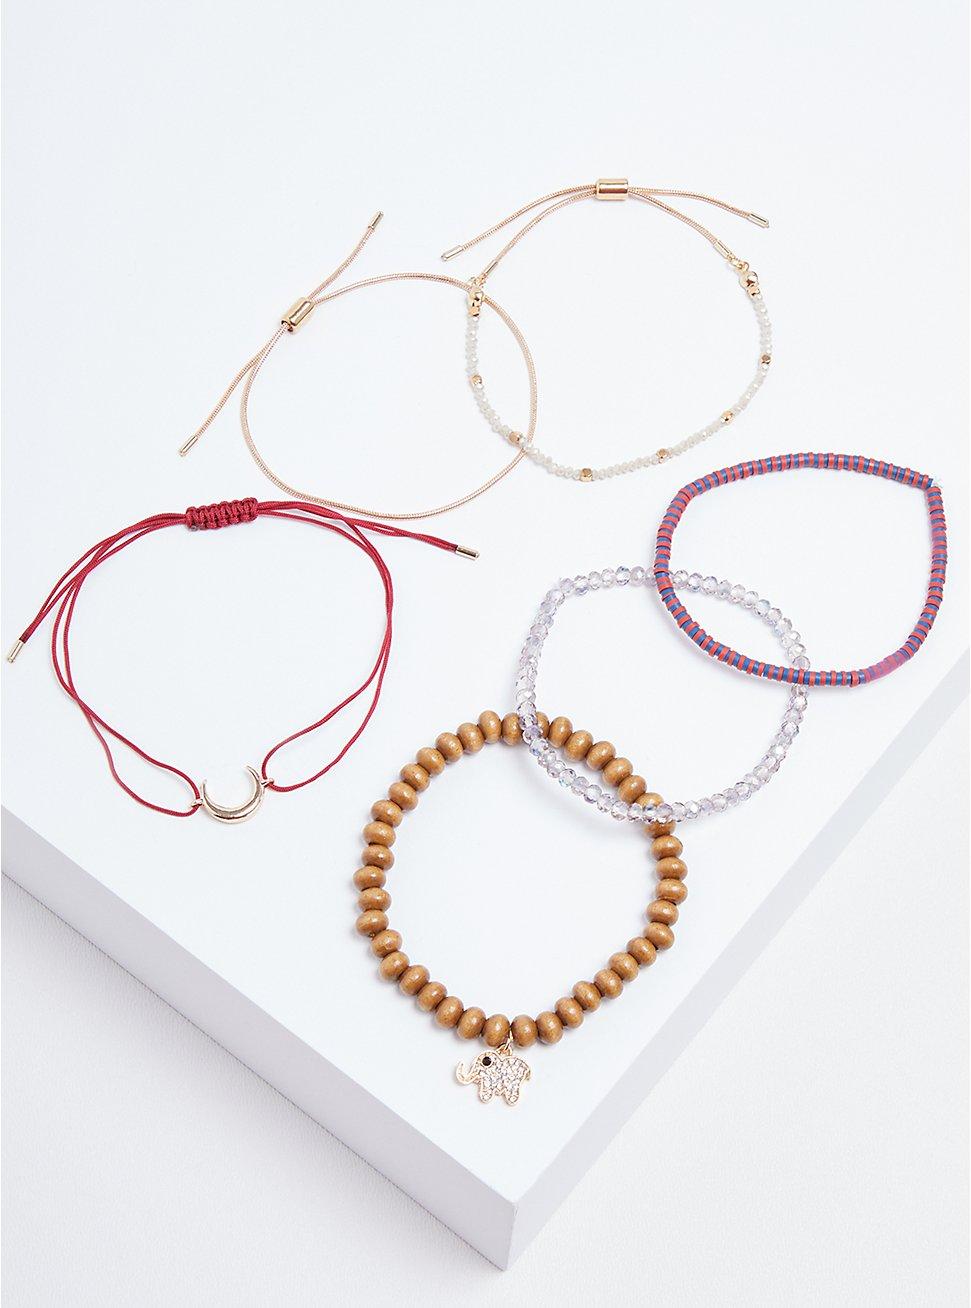 Elephant Bracelet Set of 6 - Gold Tone & Burgundy, MULTI, hi-res